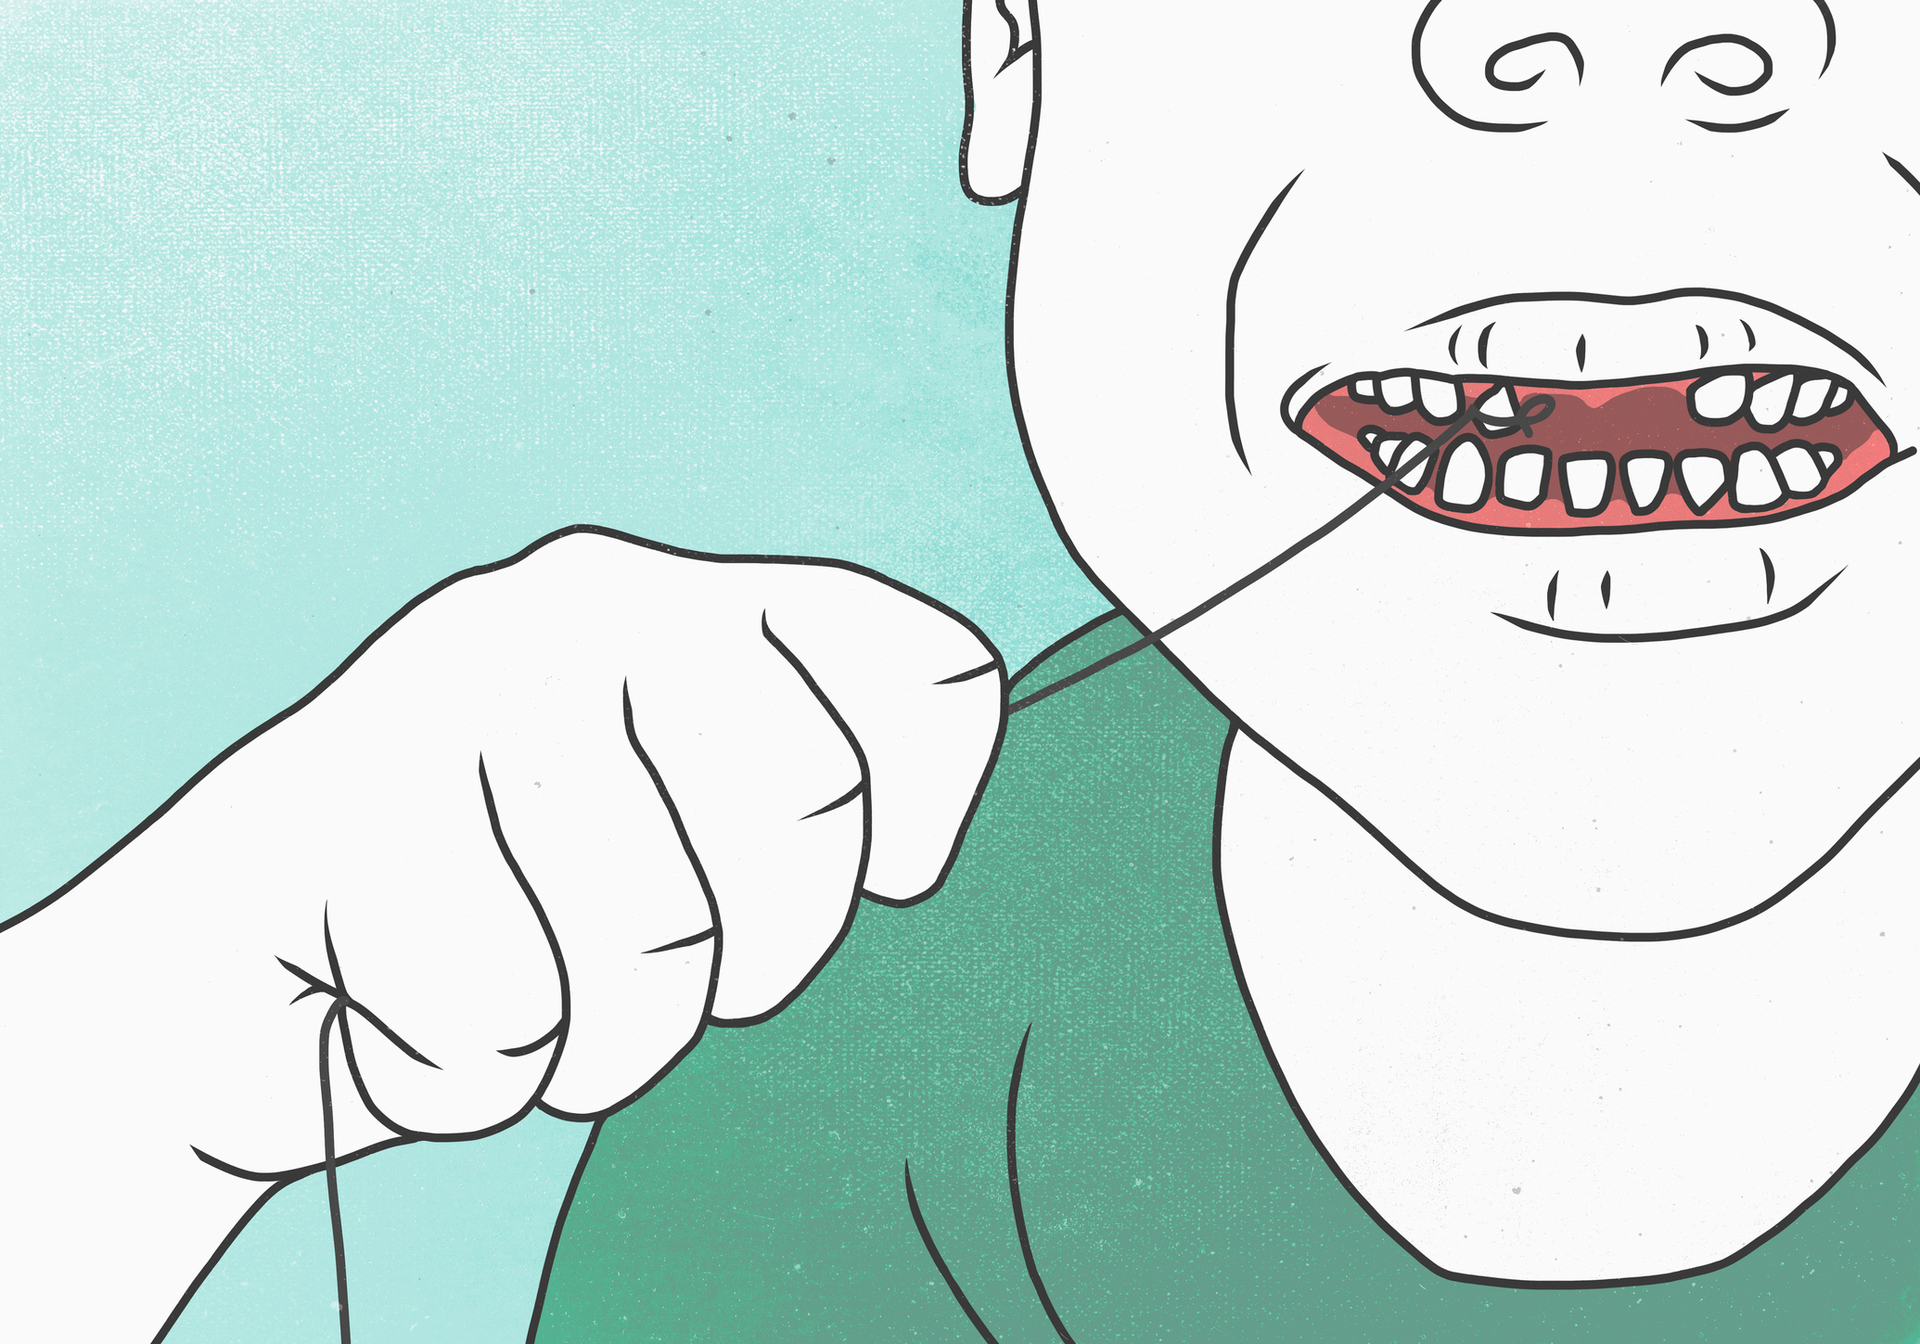 Dental care bites wallets: Kiwis leaving teeth to rot - NZ